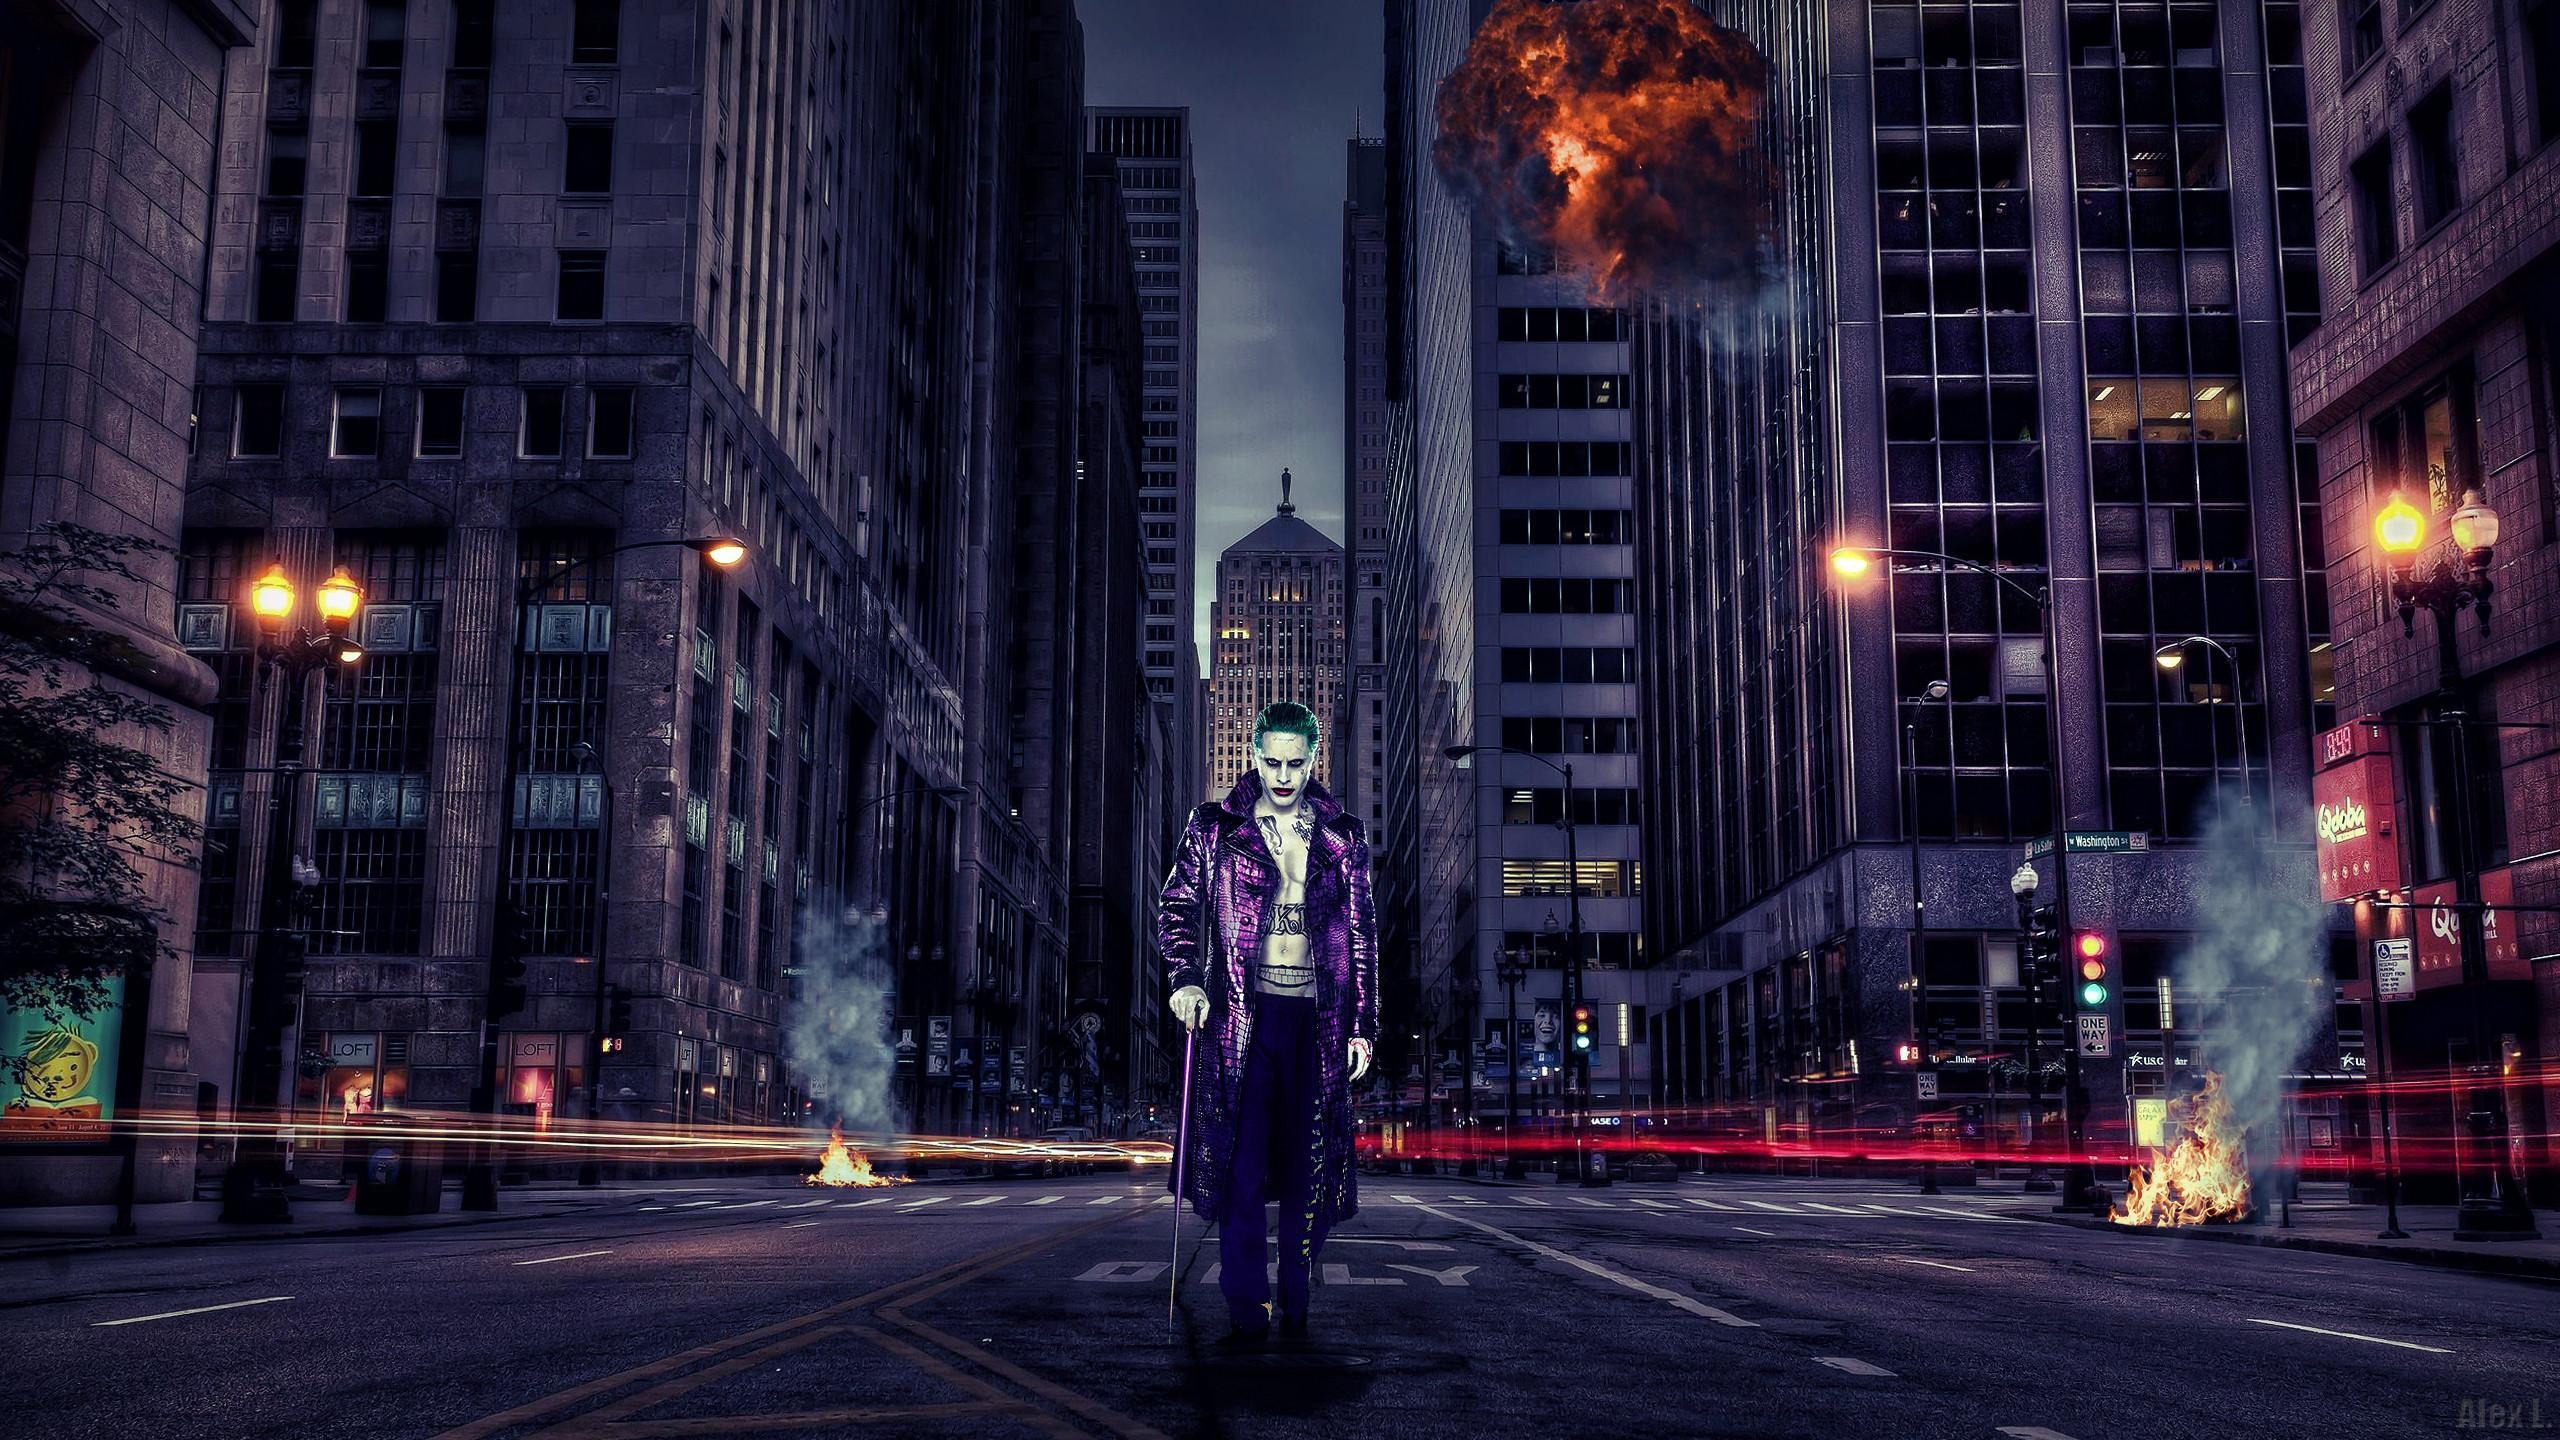 Suicide Squad Joker Wallpaper 2K by AlexLannister Suicide Squad Joker  Wallpaper 2K by AlexLannister